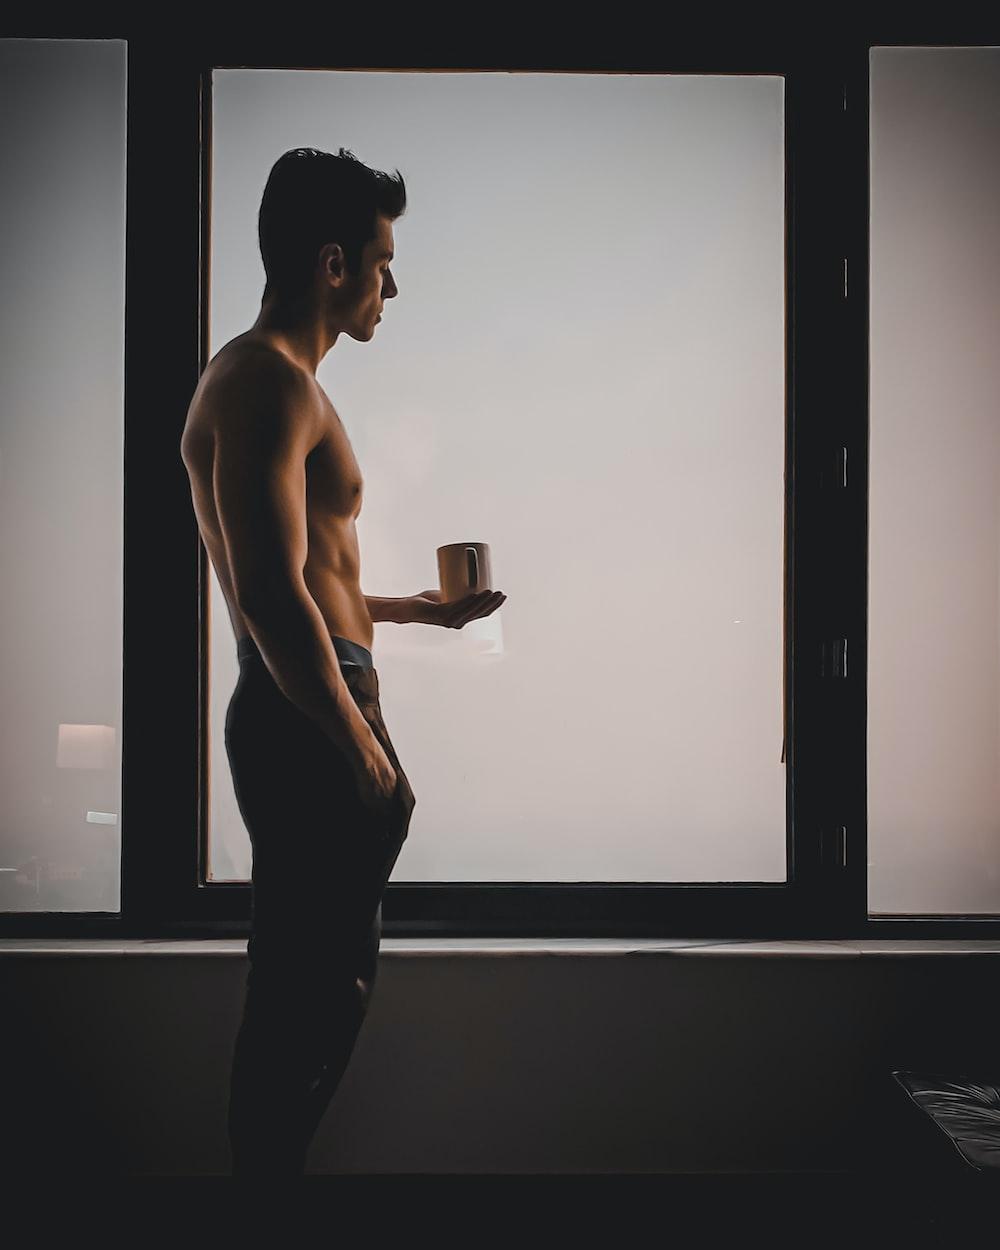 topless man in black pants holding black ceramic mug